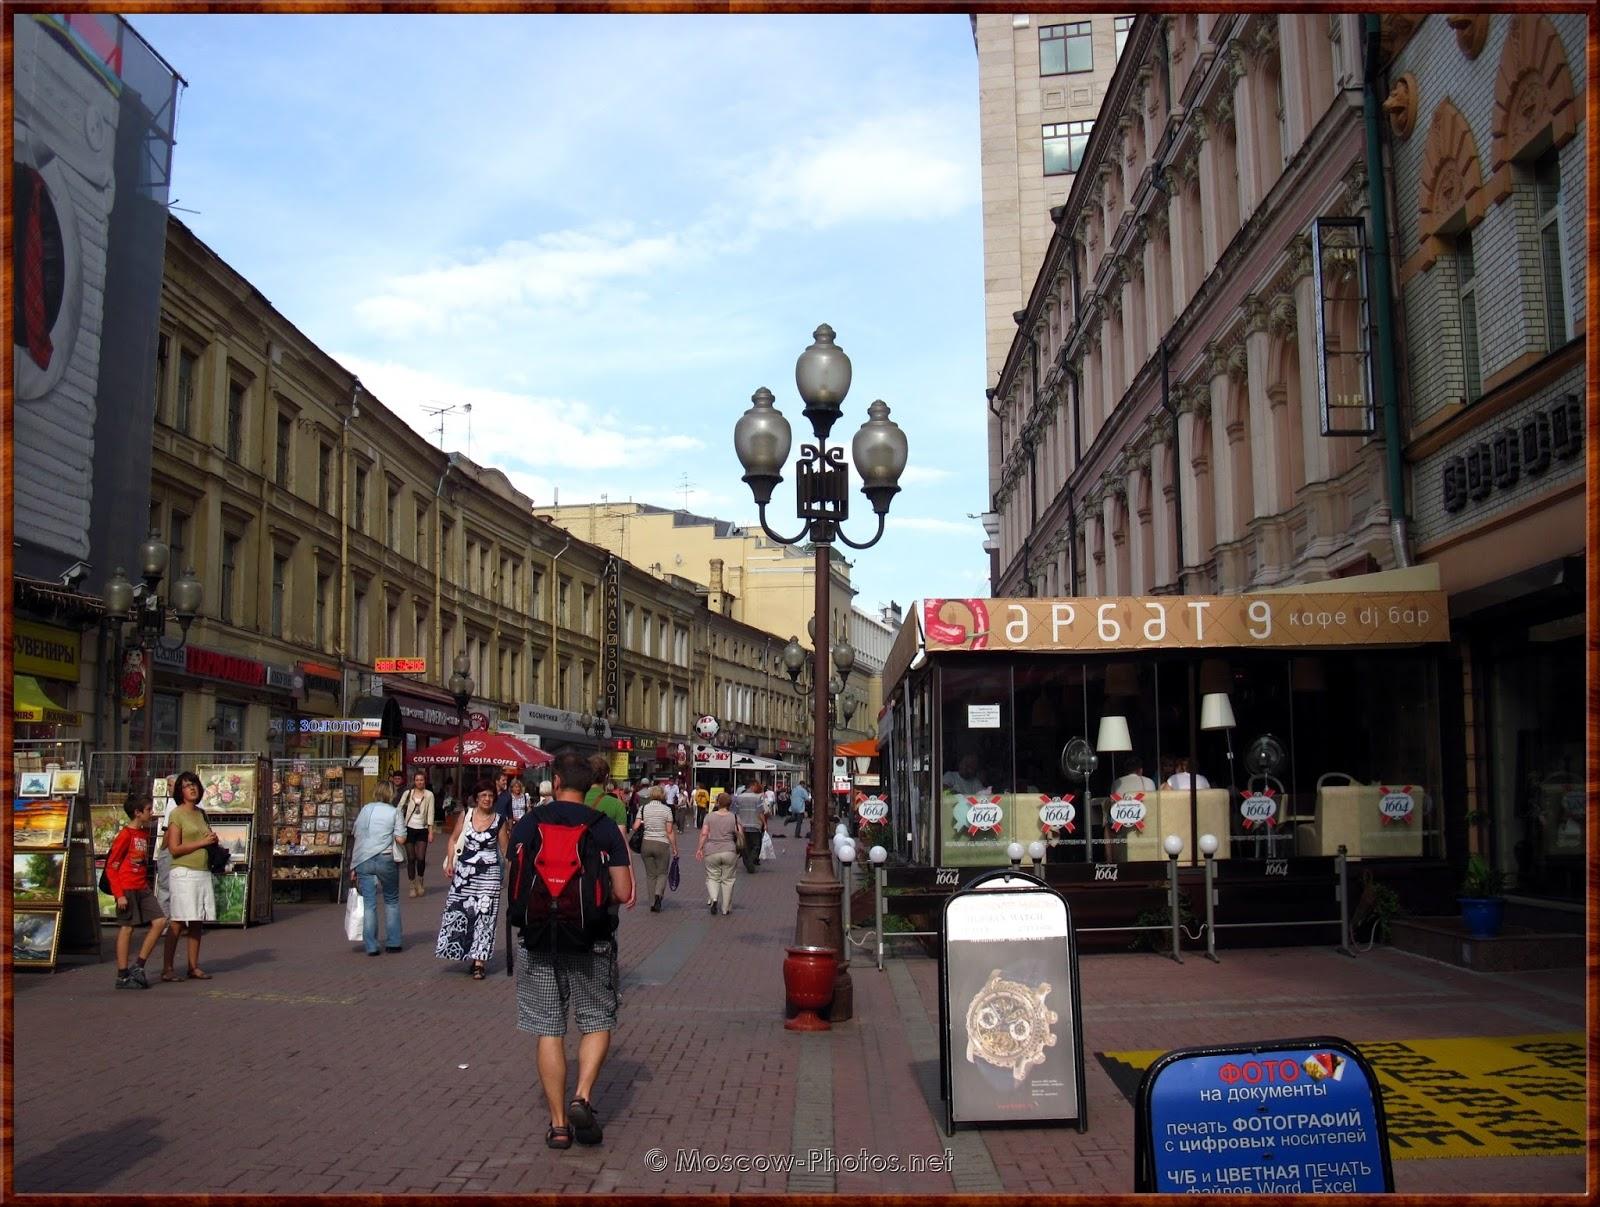 Moscow Arbat Street (Old Arbat)